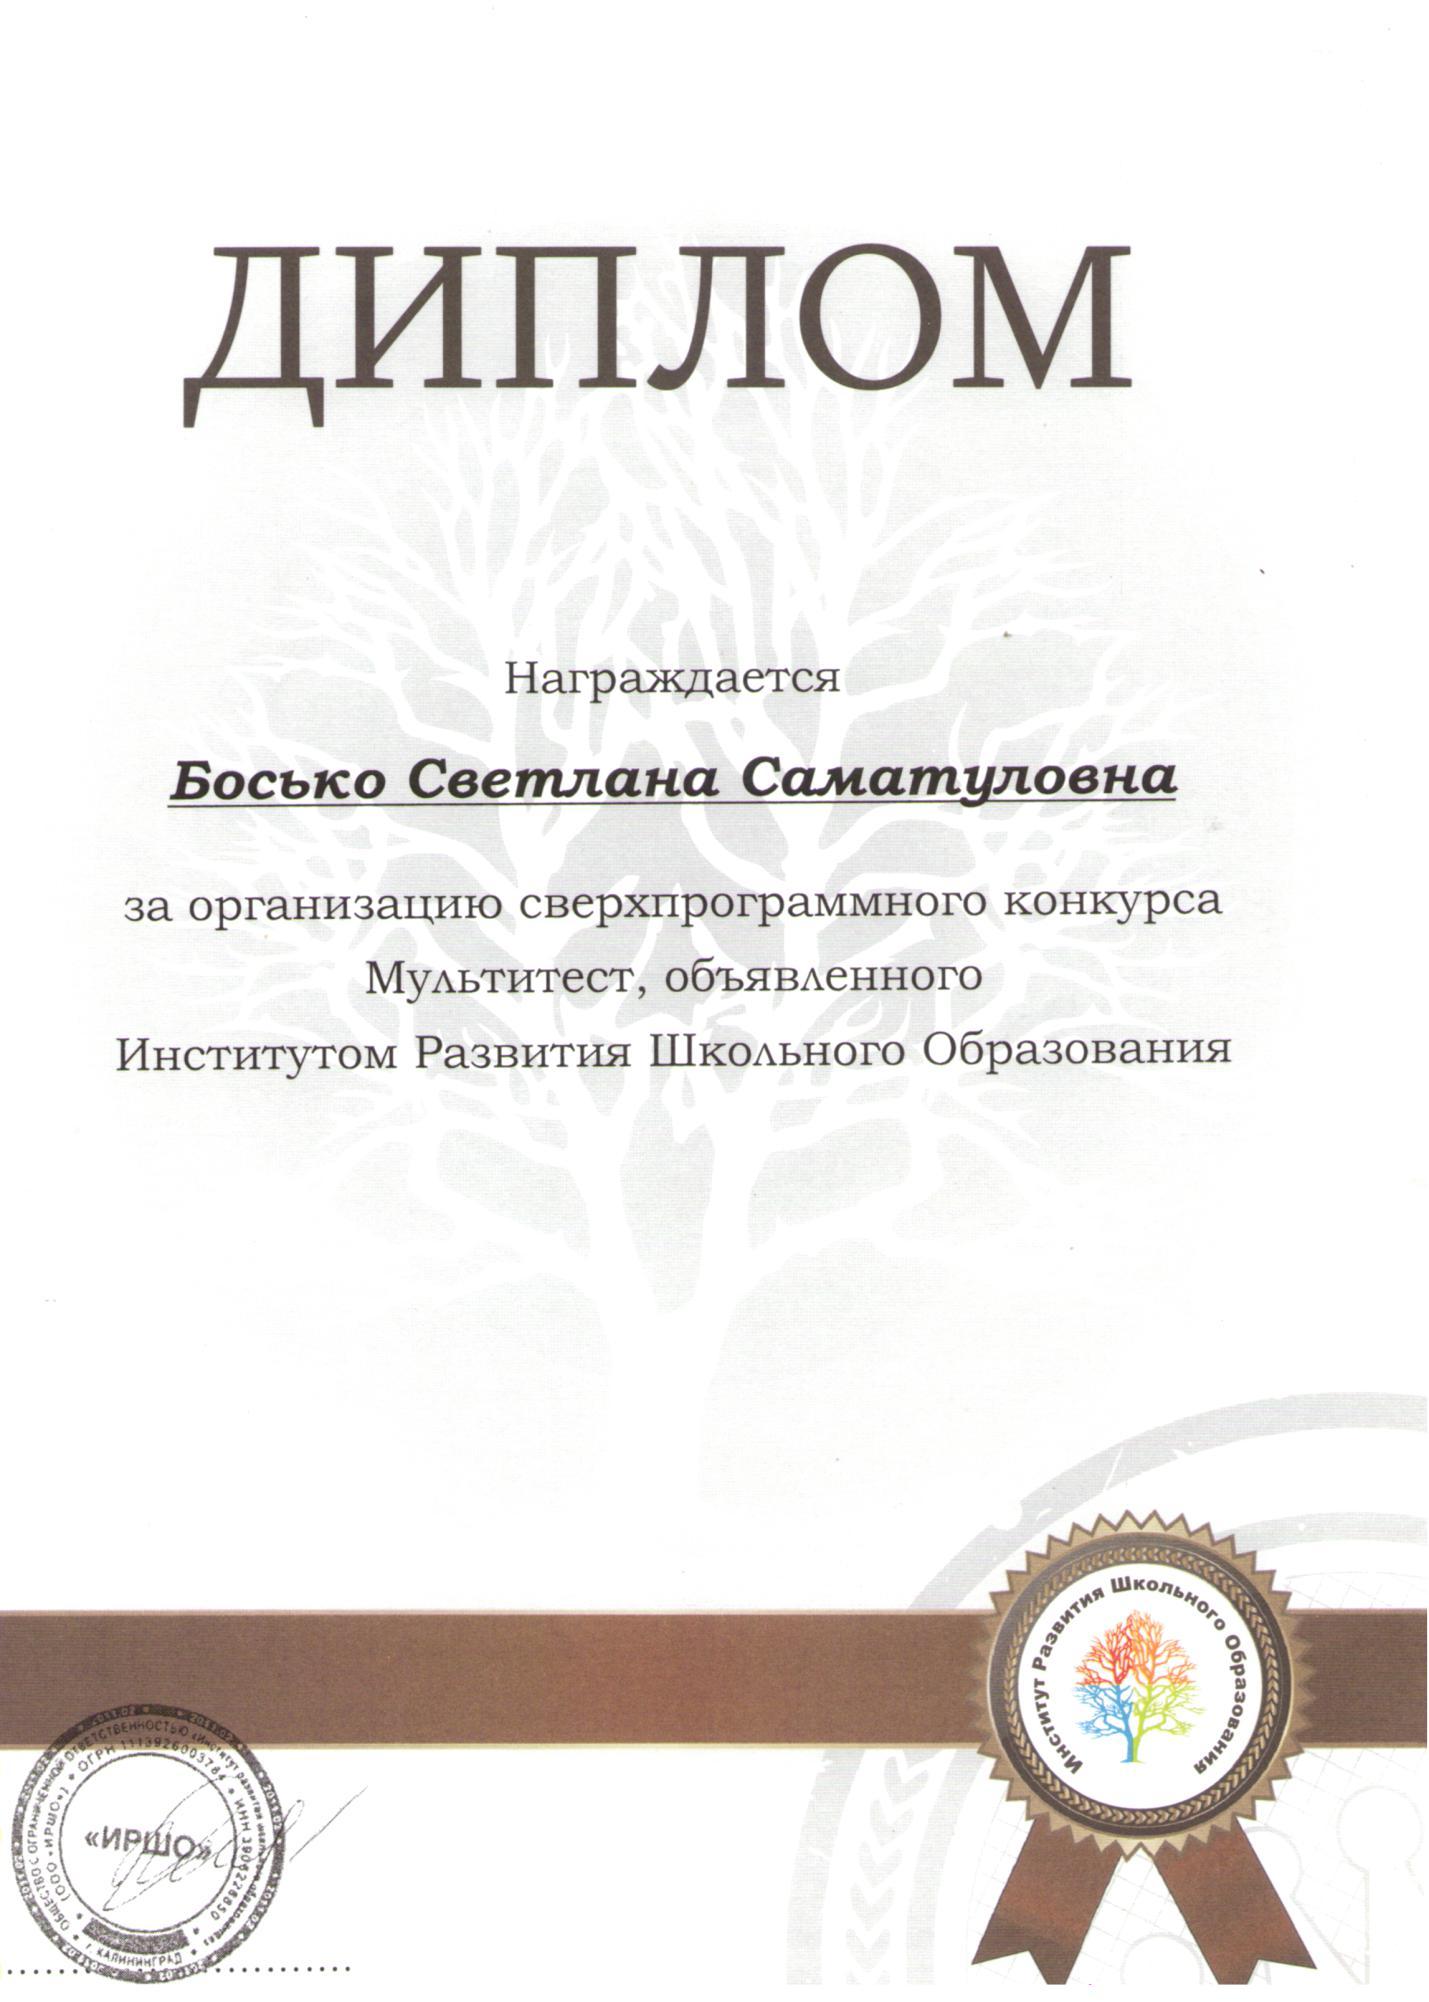 C:\Documents and Settings\Светлана Саматуловна\Рабочий стол\квалификация\13 грам.tif